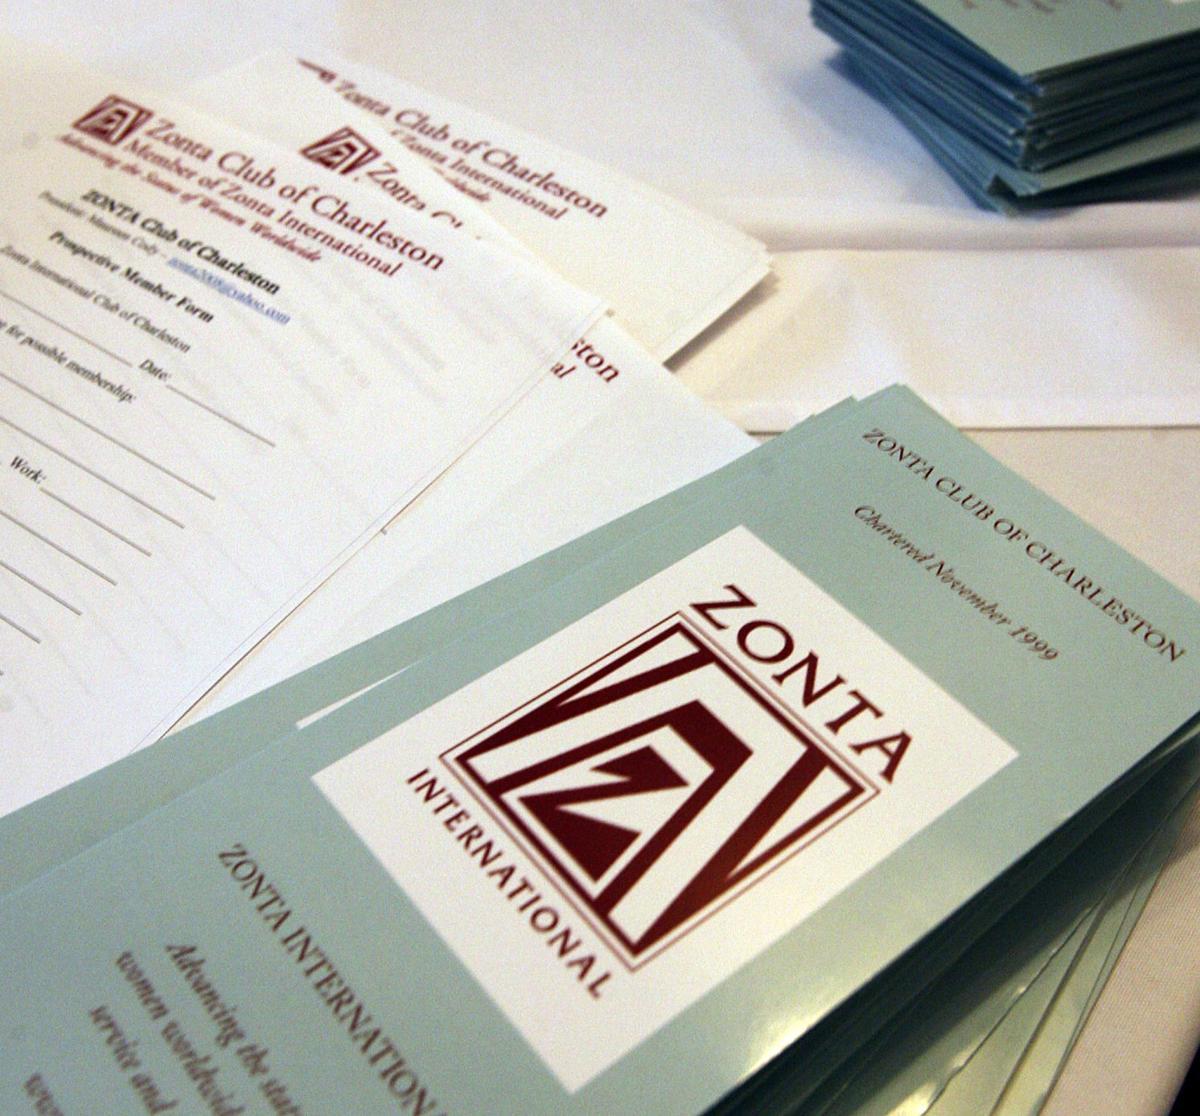 Zonta Club of Charleston hosts 5th Breaking the Silence Awards Gala